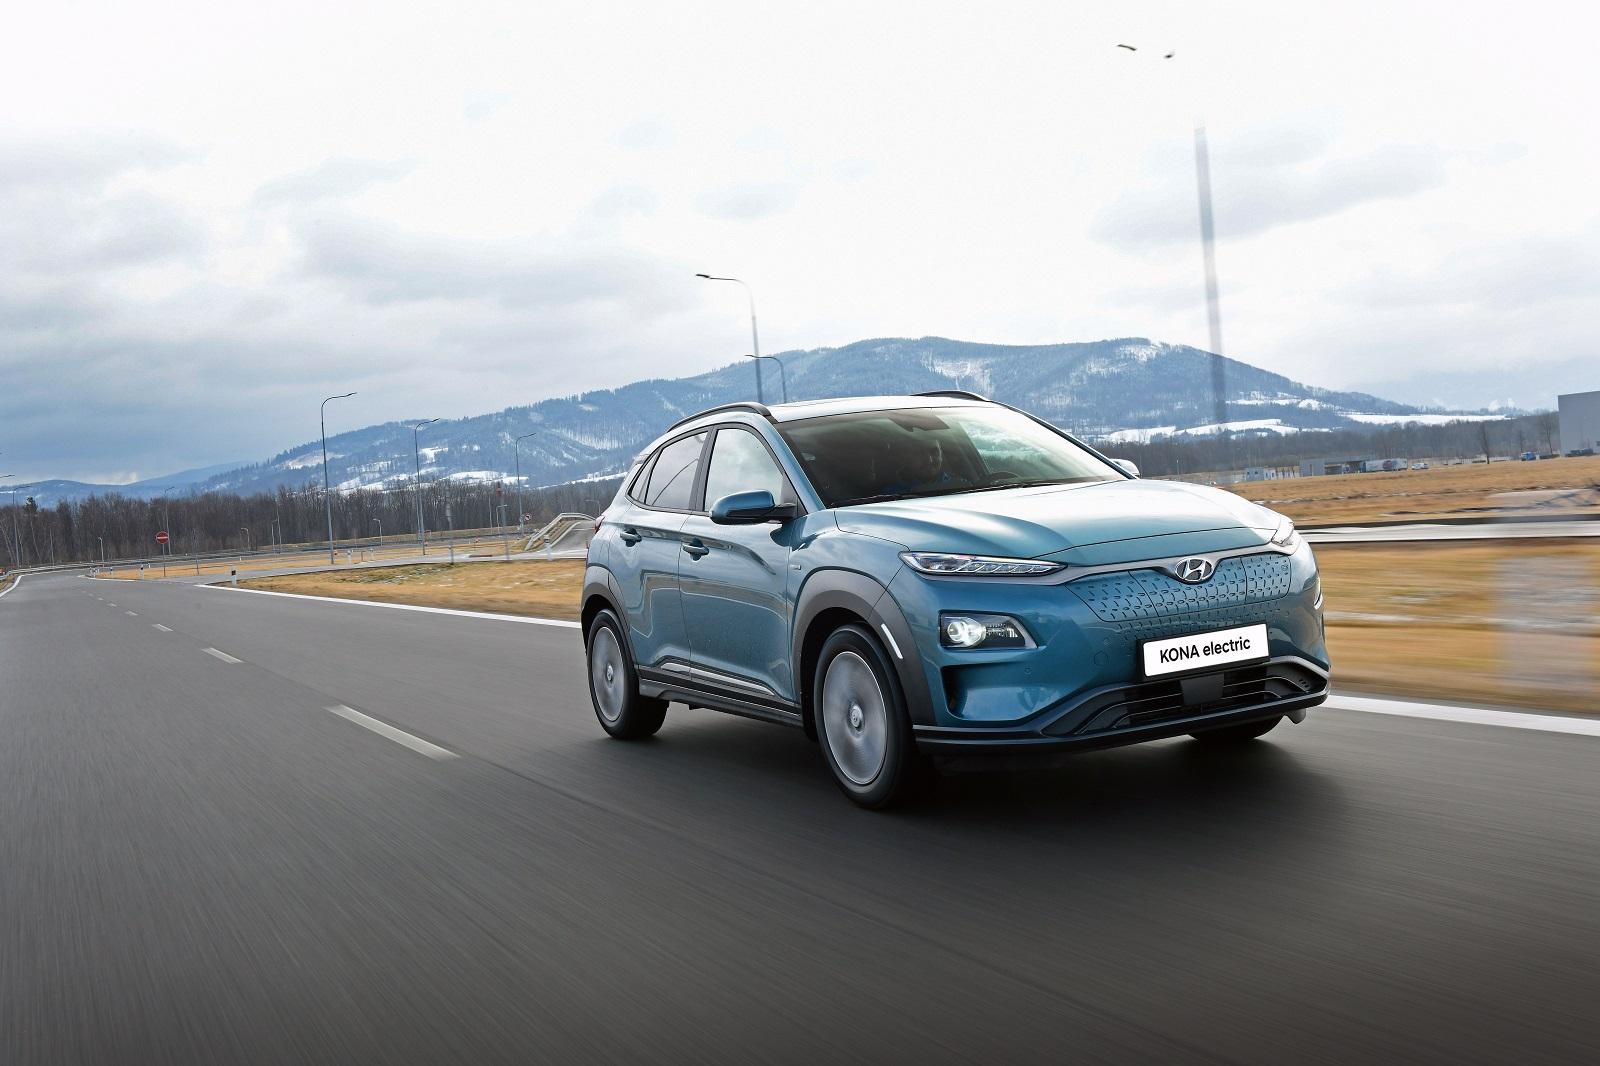 Hyundai Kona Ev Neumaticos